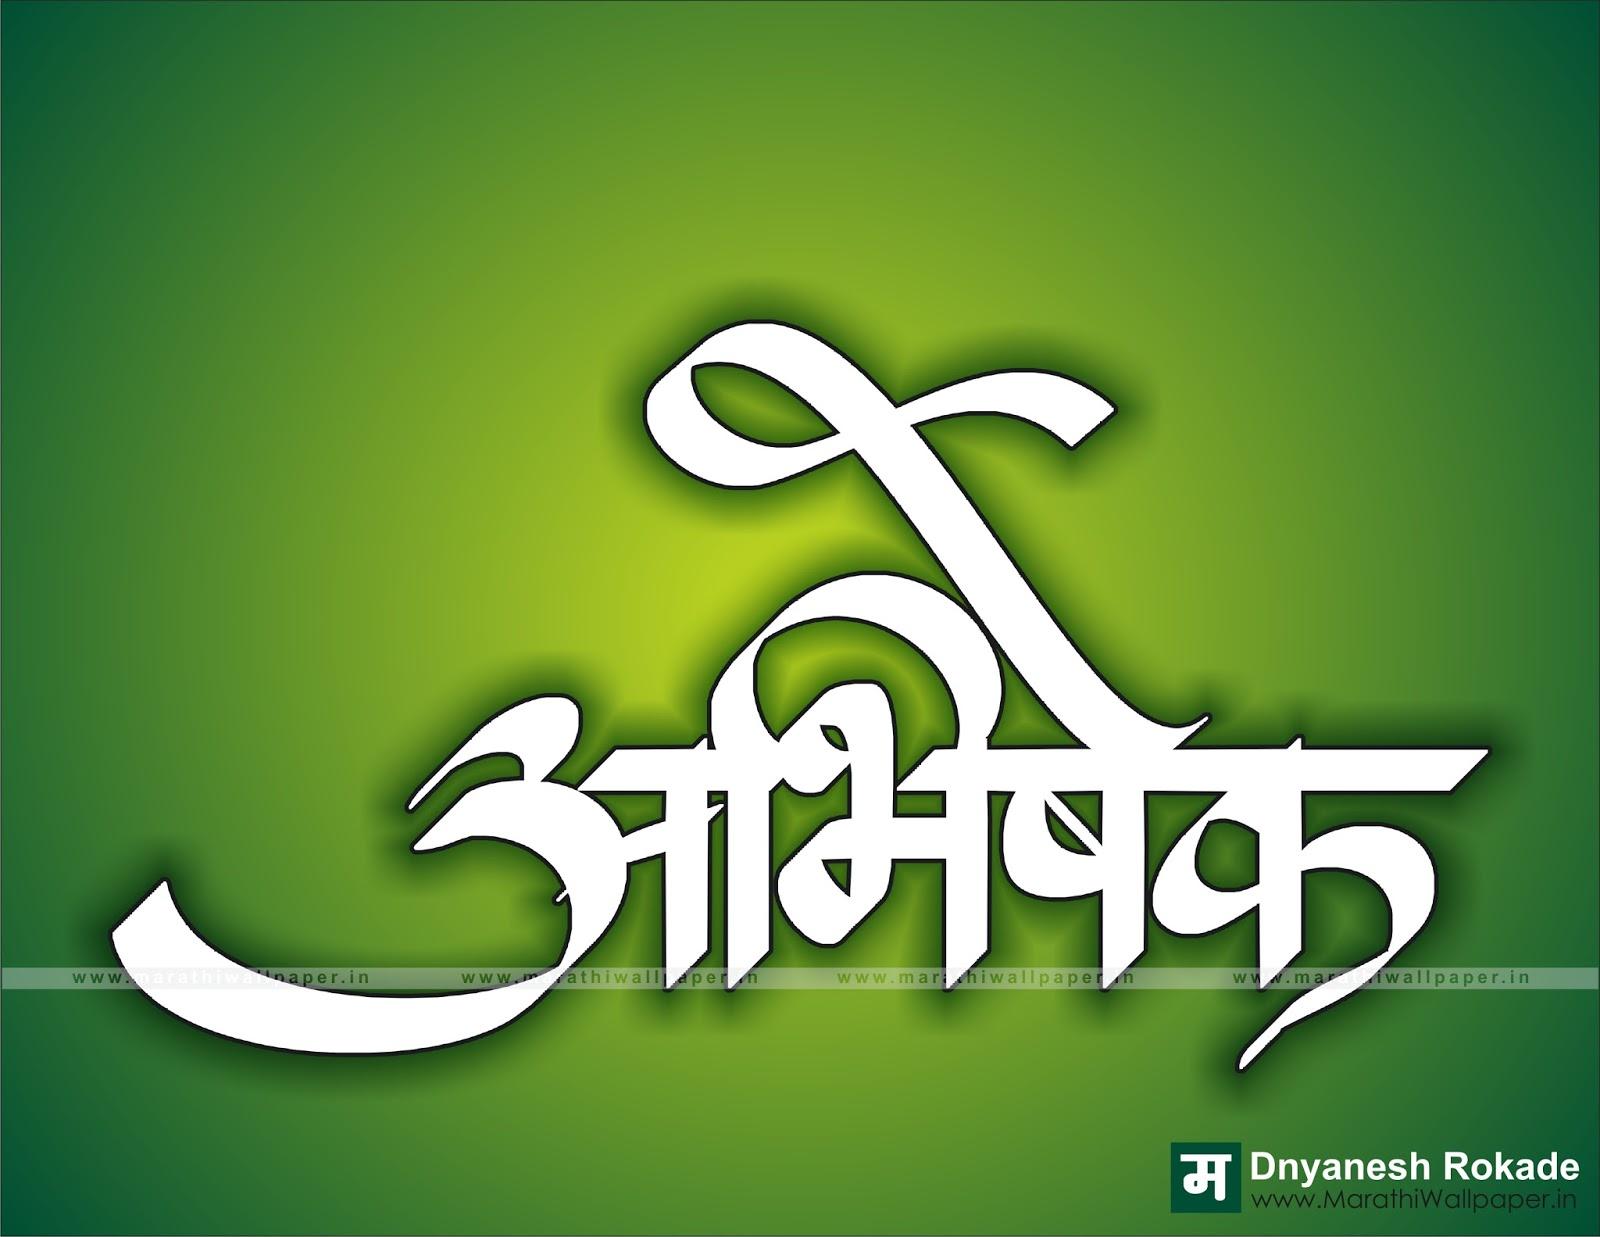 3d Wallpaper Name Rahul Amol Bhai Name Dl Wallpaper Mix With Birds Sorgusuna Uygun